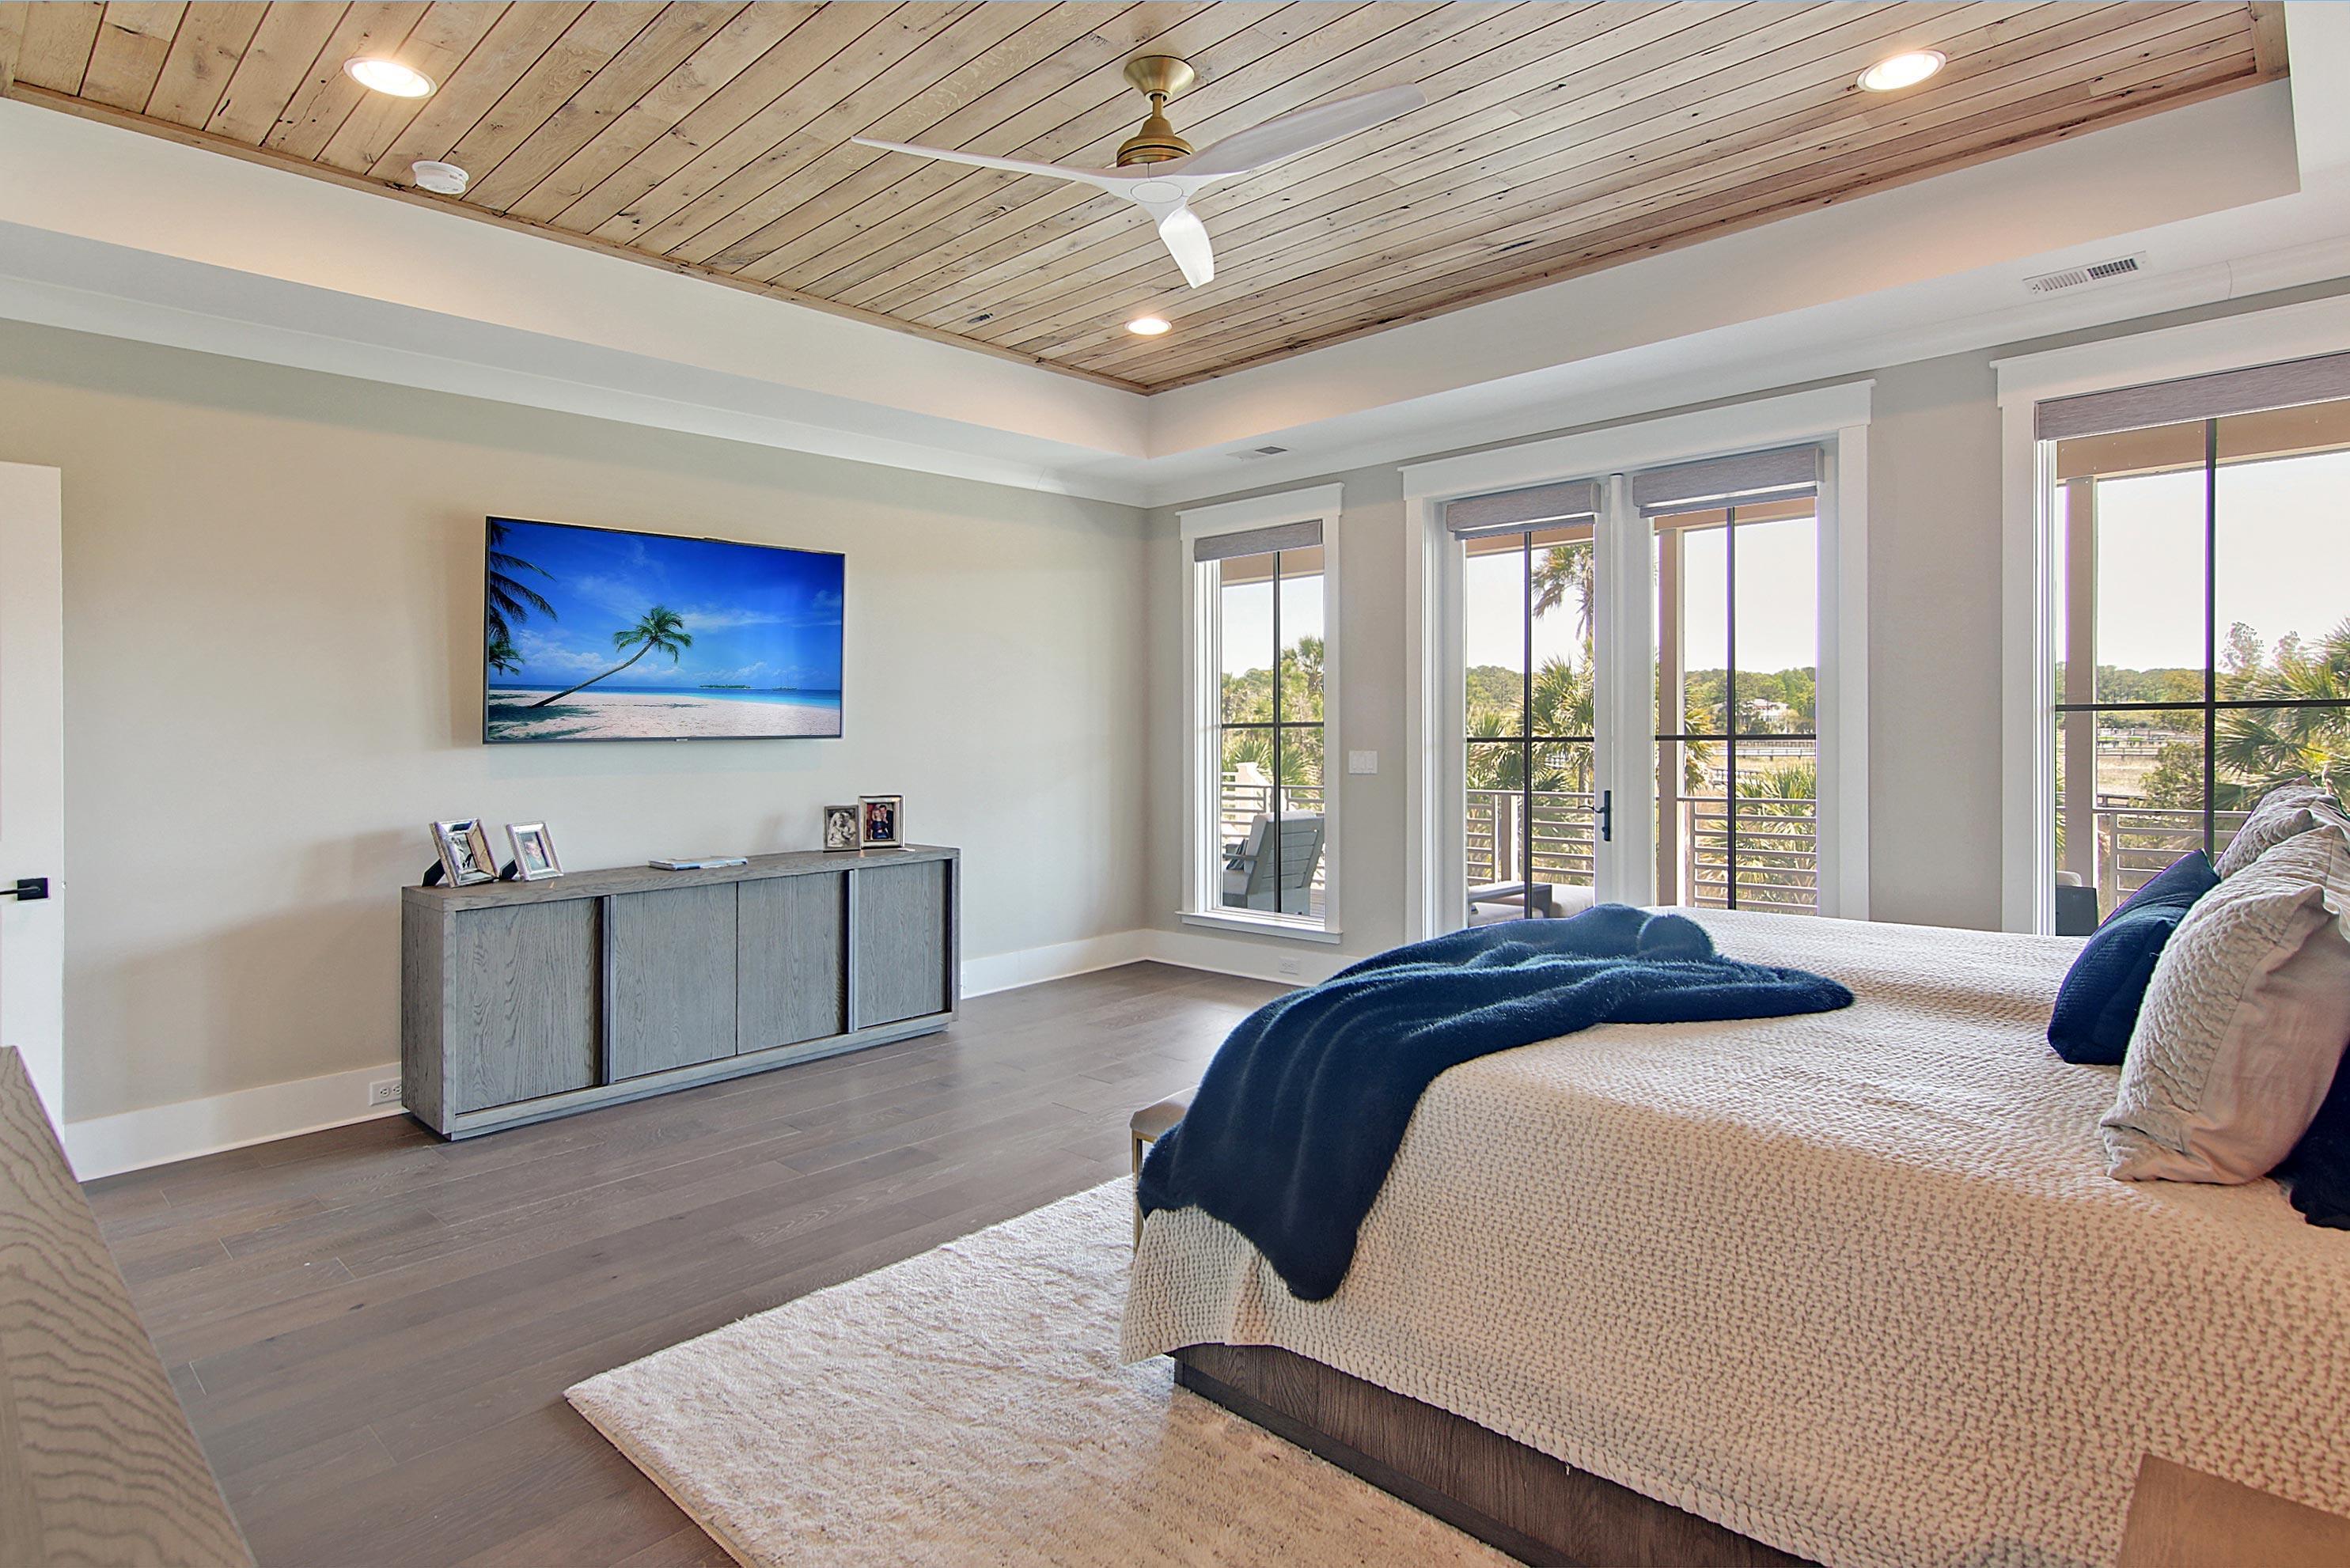 Dunes West Homes For Sale - 2456 Darts Cove, Mount Pleasant, SC - 46